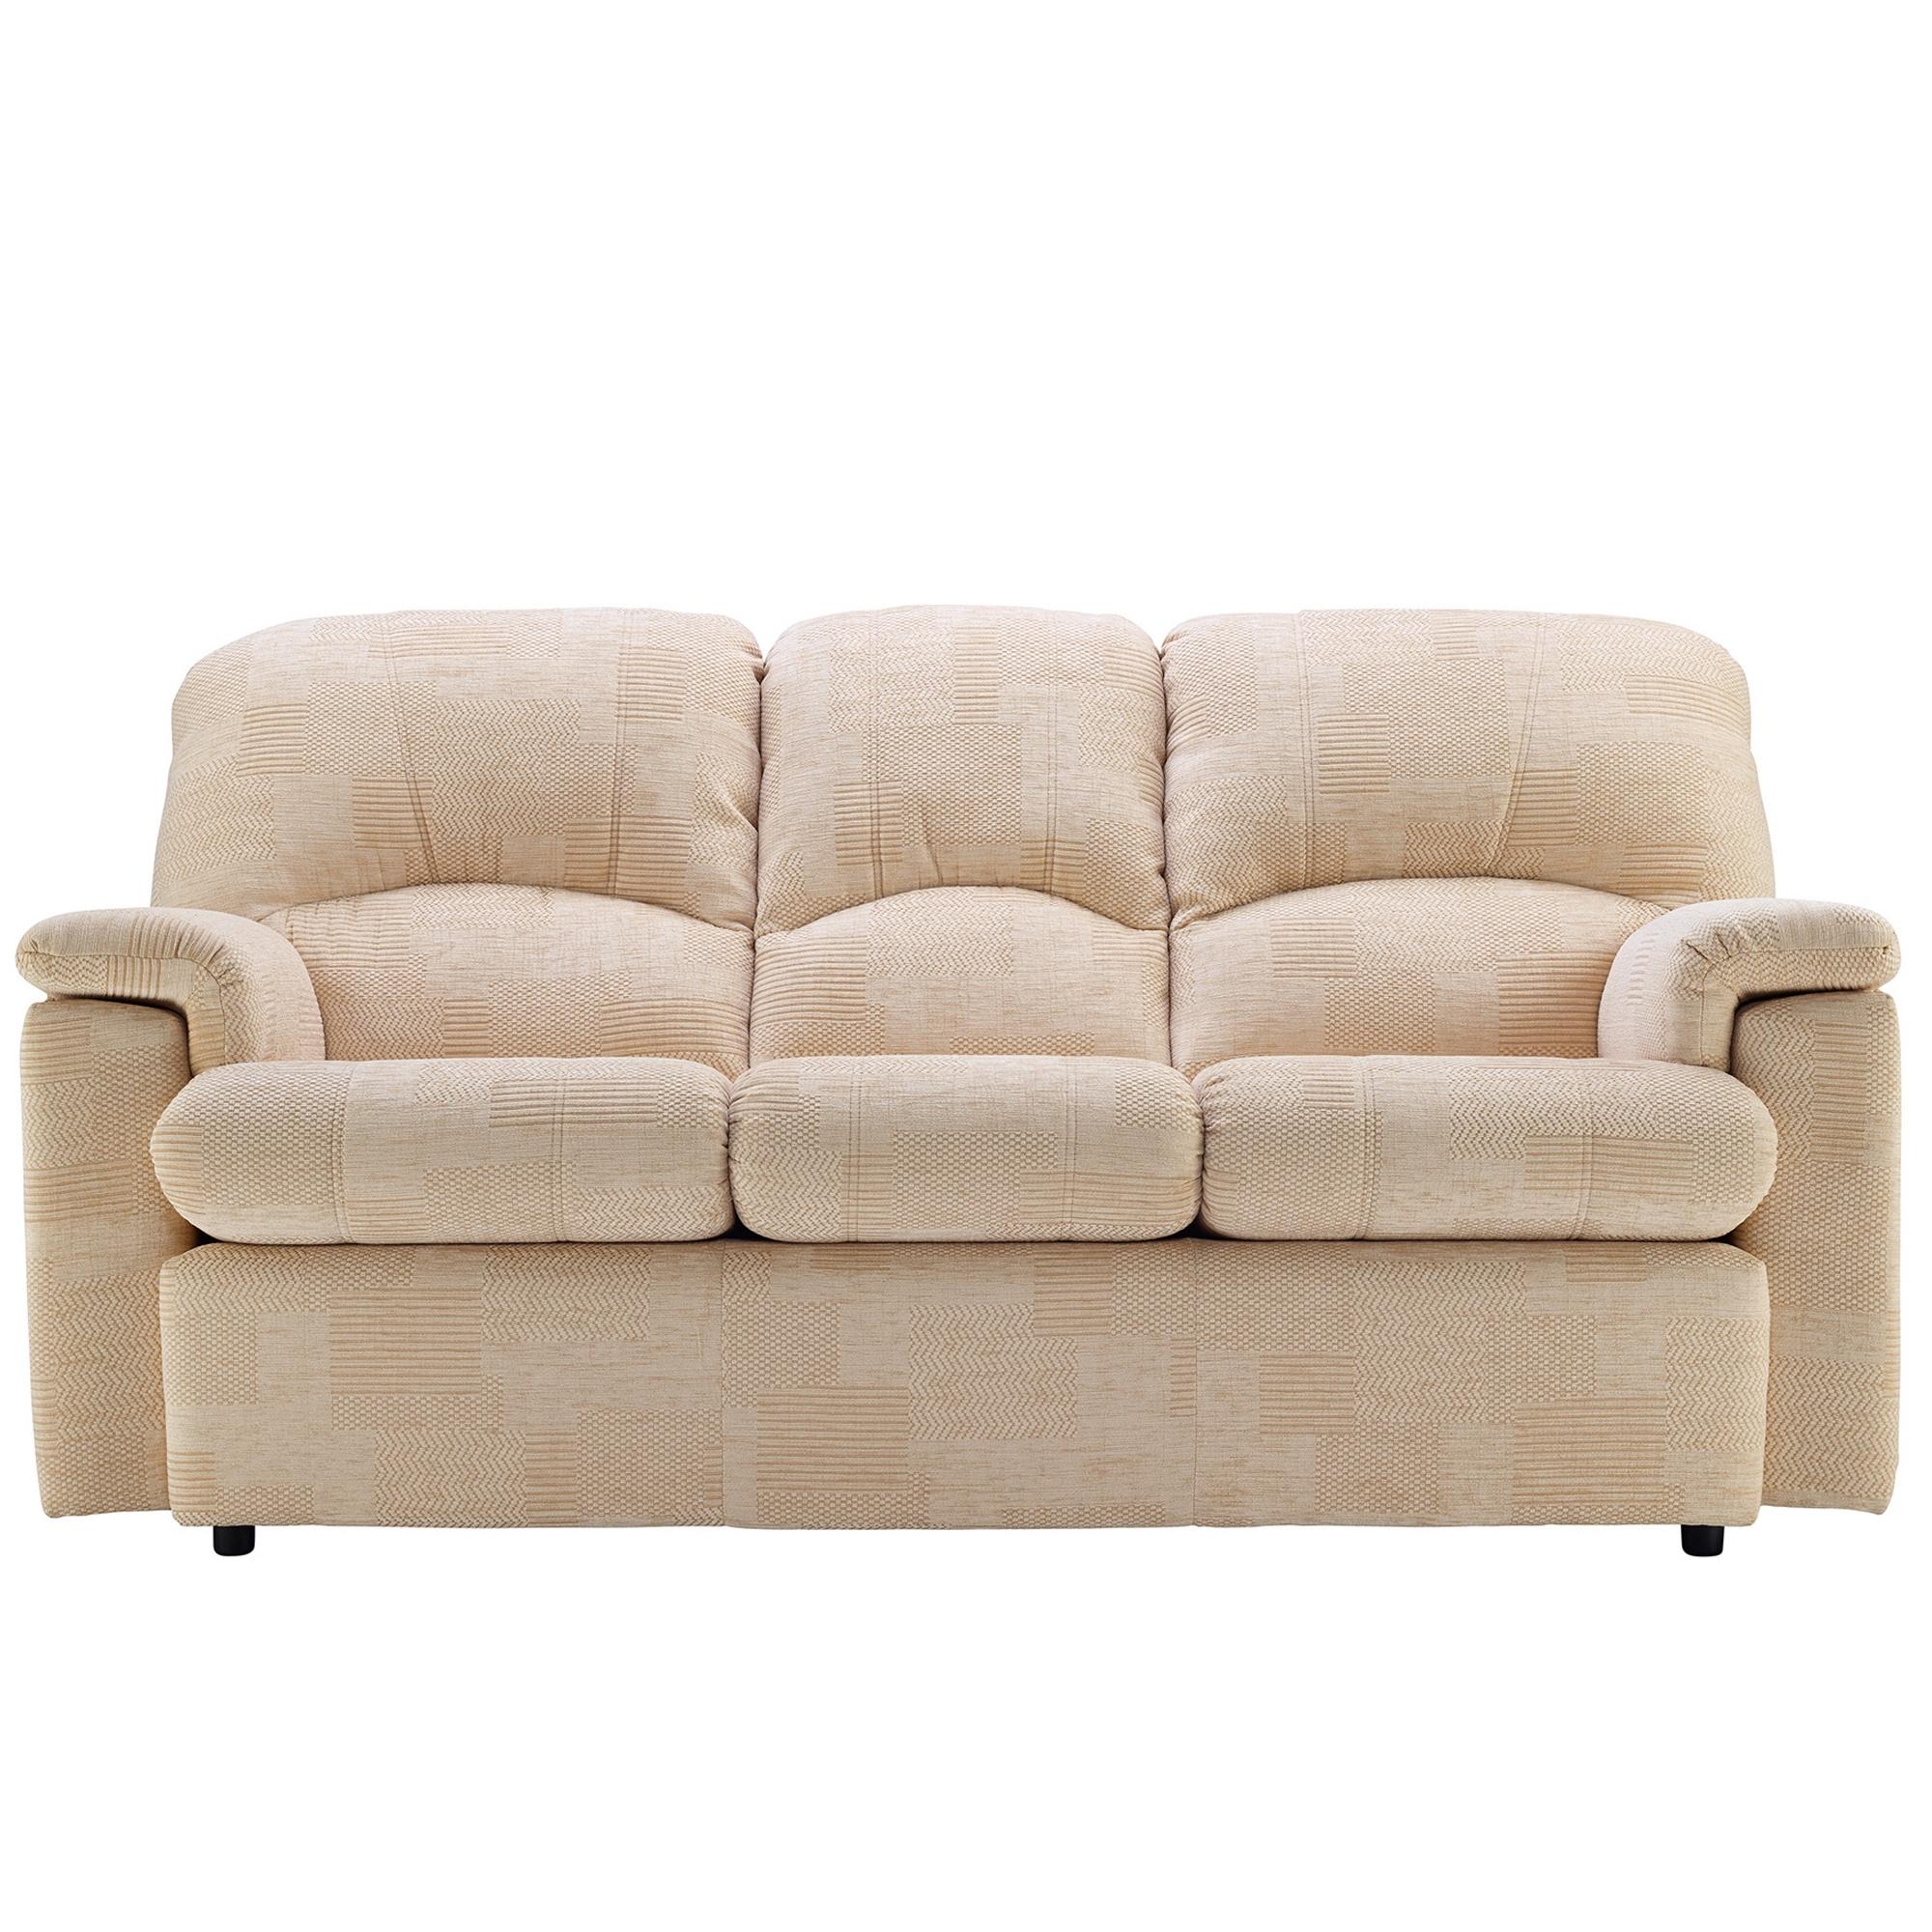 G Plan Chloe 3 Seater Sofa All Sofas